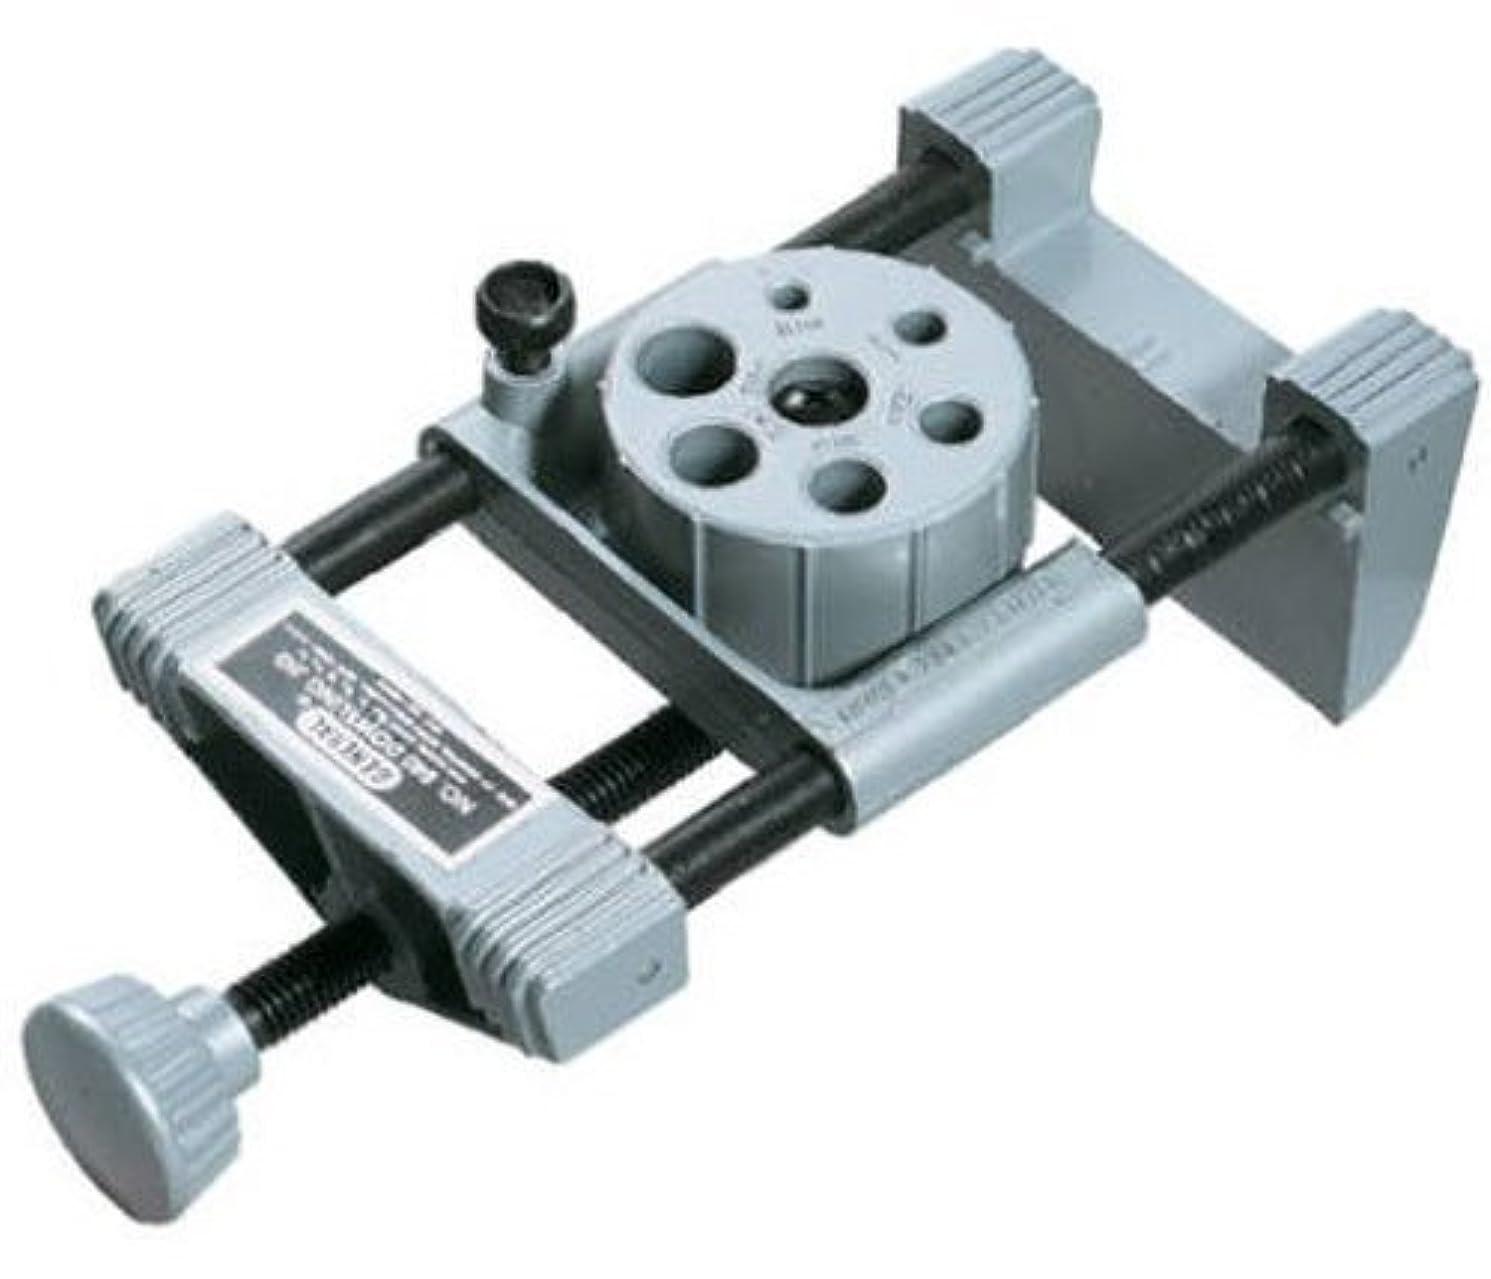 General Tools 840 Pro Doweling Jig Kit